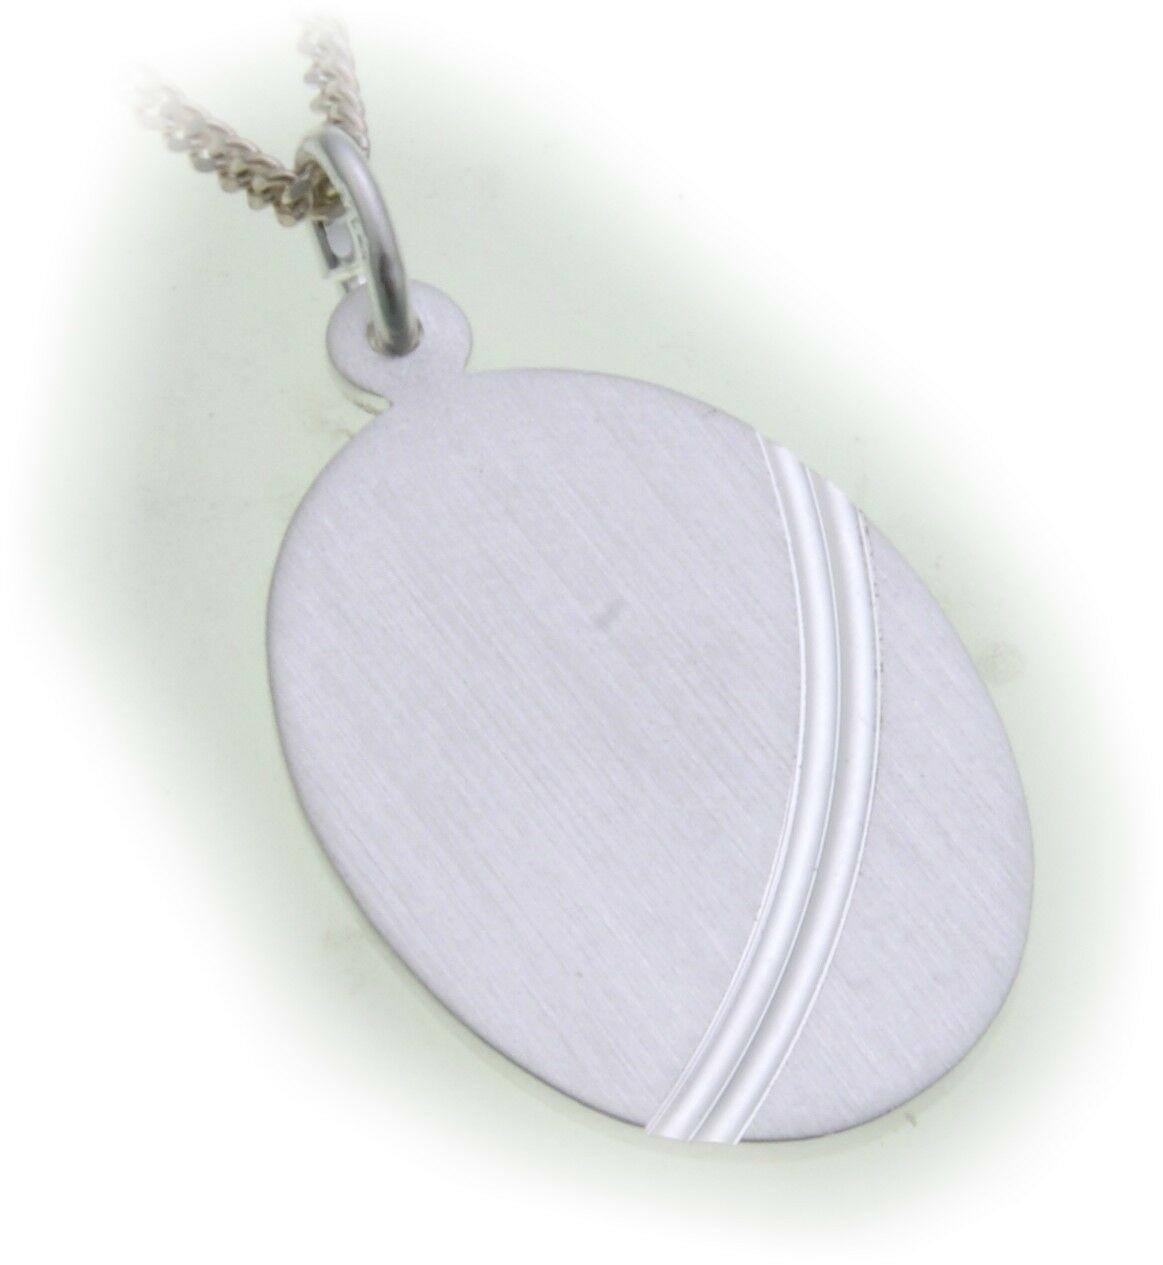 Anhänger Gravurplatte Oval echt Silber 925 ink Gravur matt Sterlingsilber Unisex